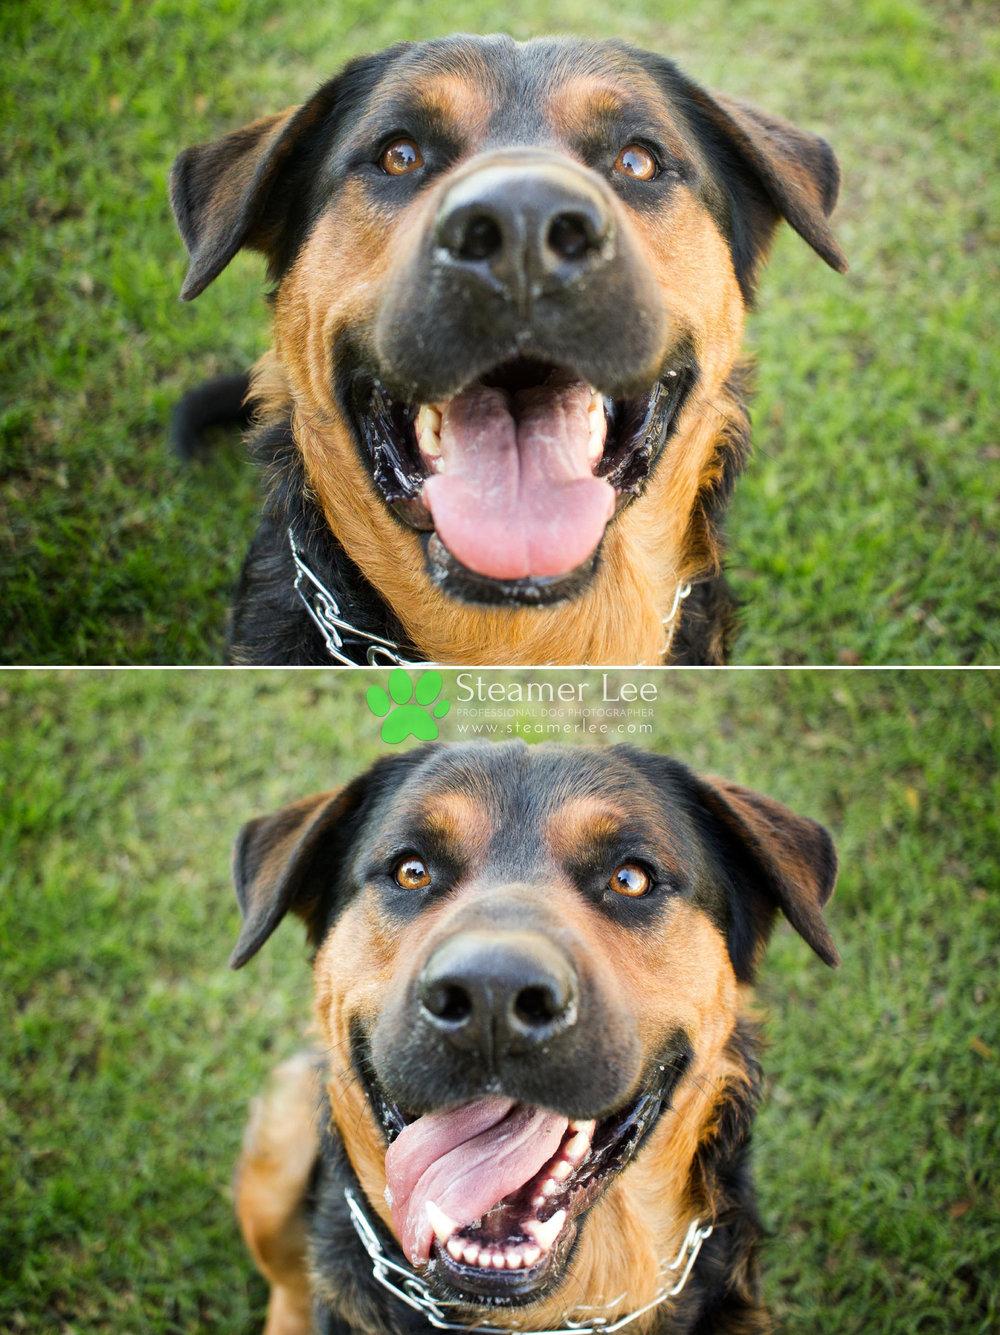 001 Steamer Lee Dog Photography - Orange County Dog Photography - German Shepherd Rottweiler Mix_Poodle.JPG